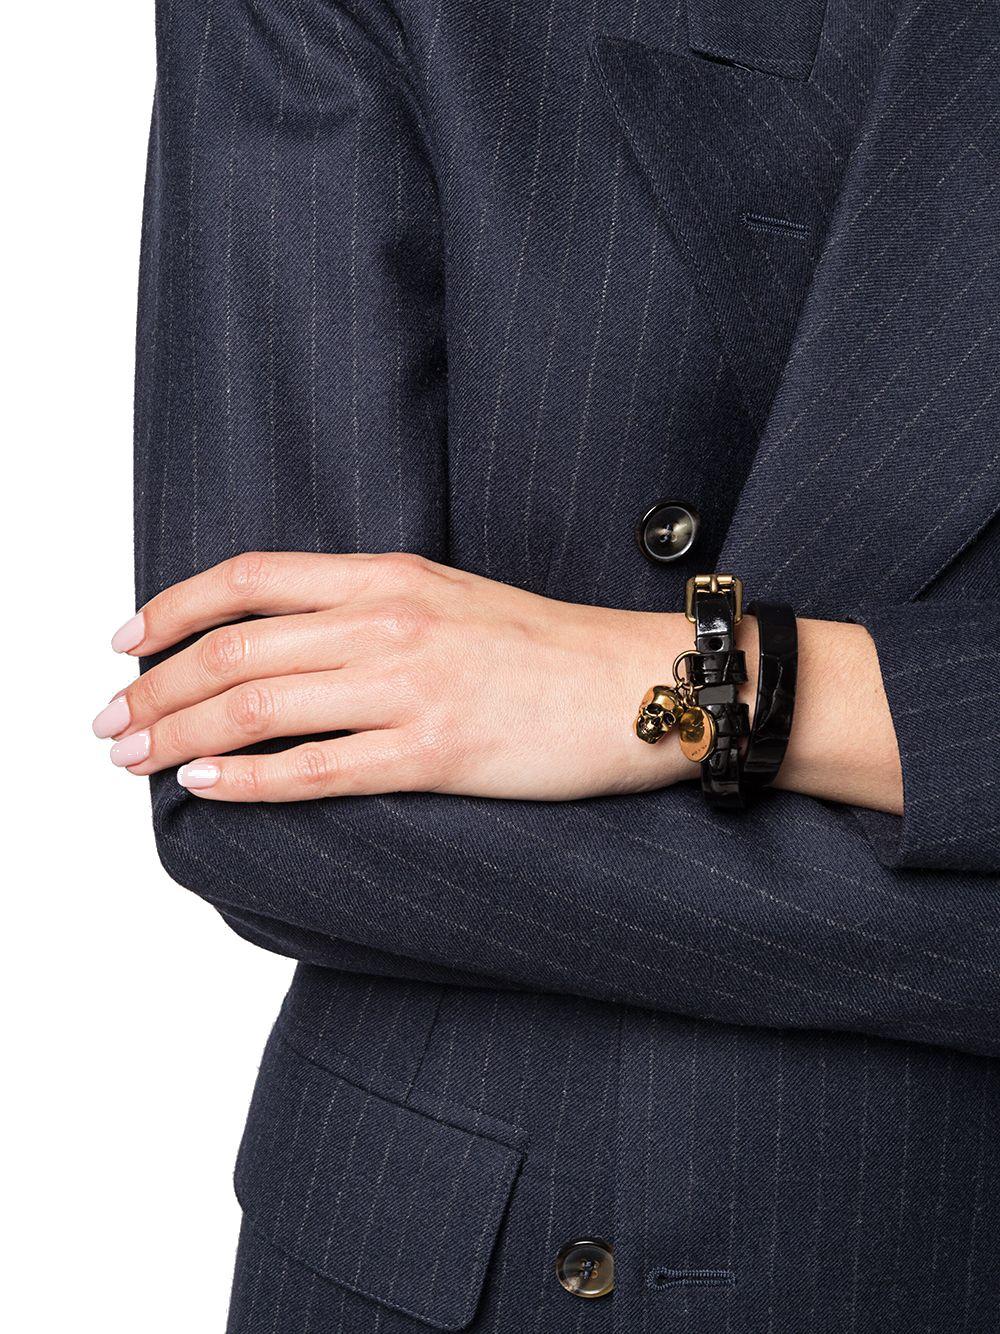 ALEXANDER MCQUEEN Bracelets ALEXANDER MCQUEEN WOMEN'S BLACK LEATHER BRACELET